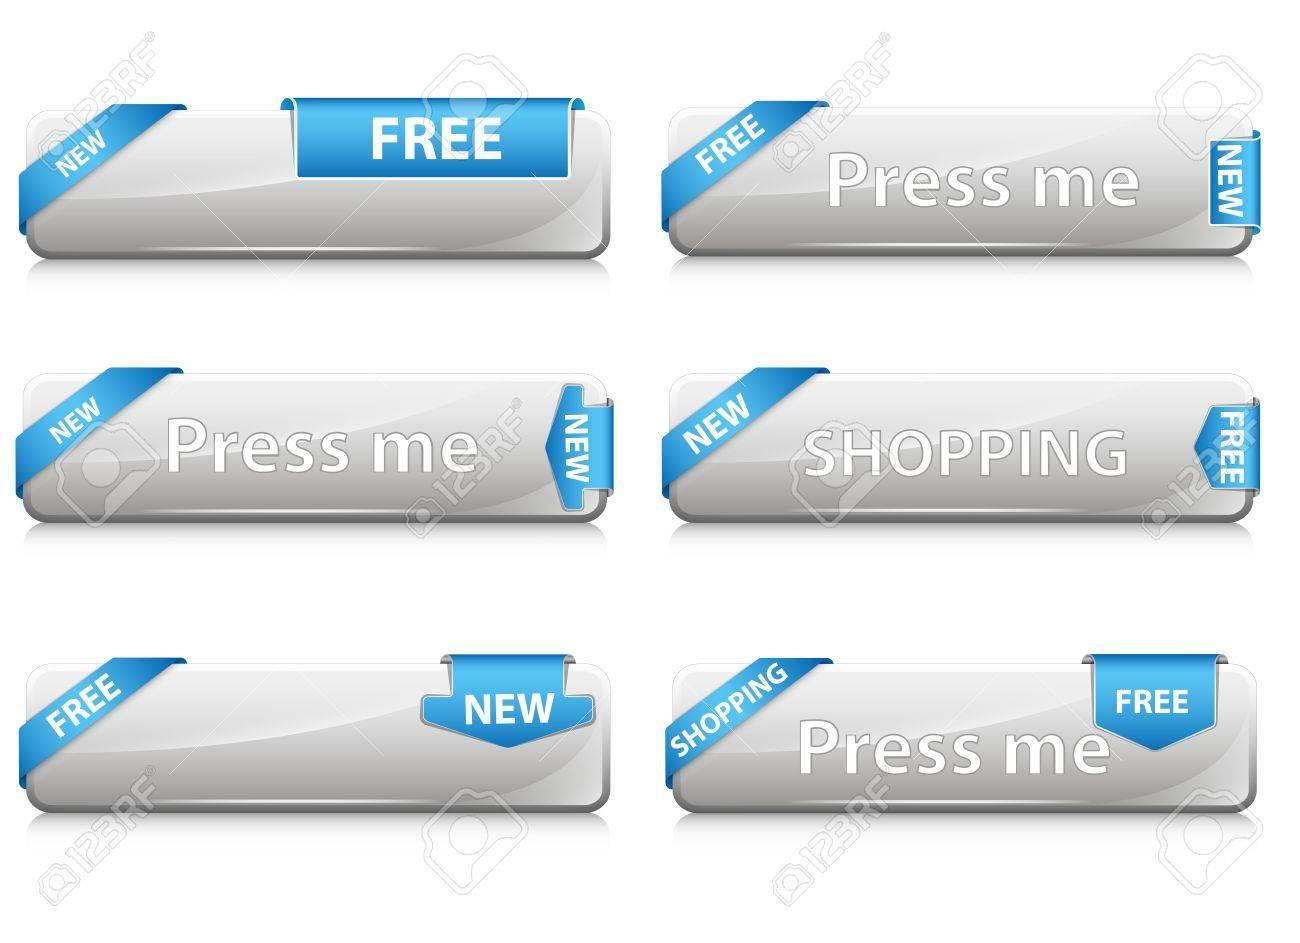 Web Buttons Vectors Stock Vector - 15143967